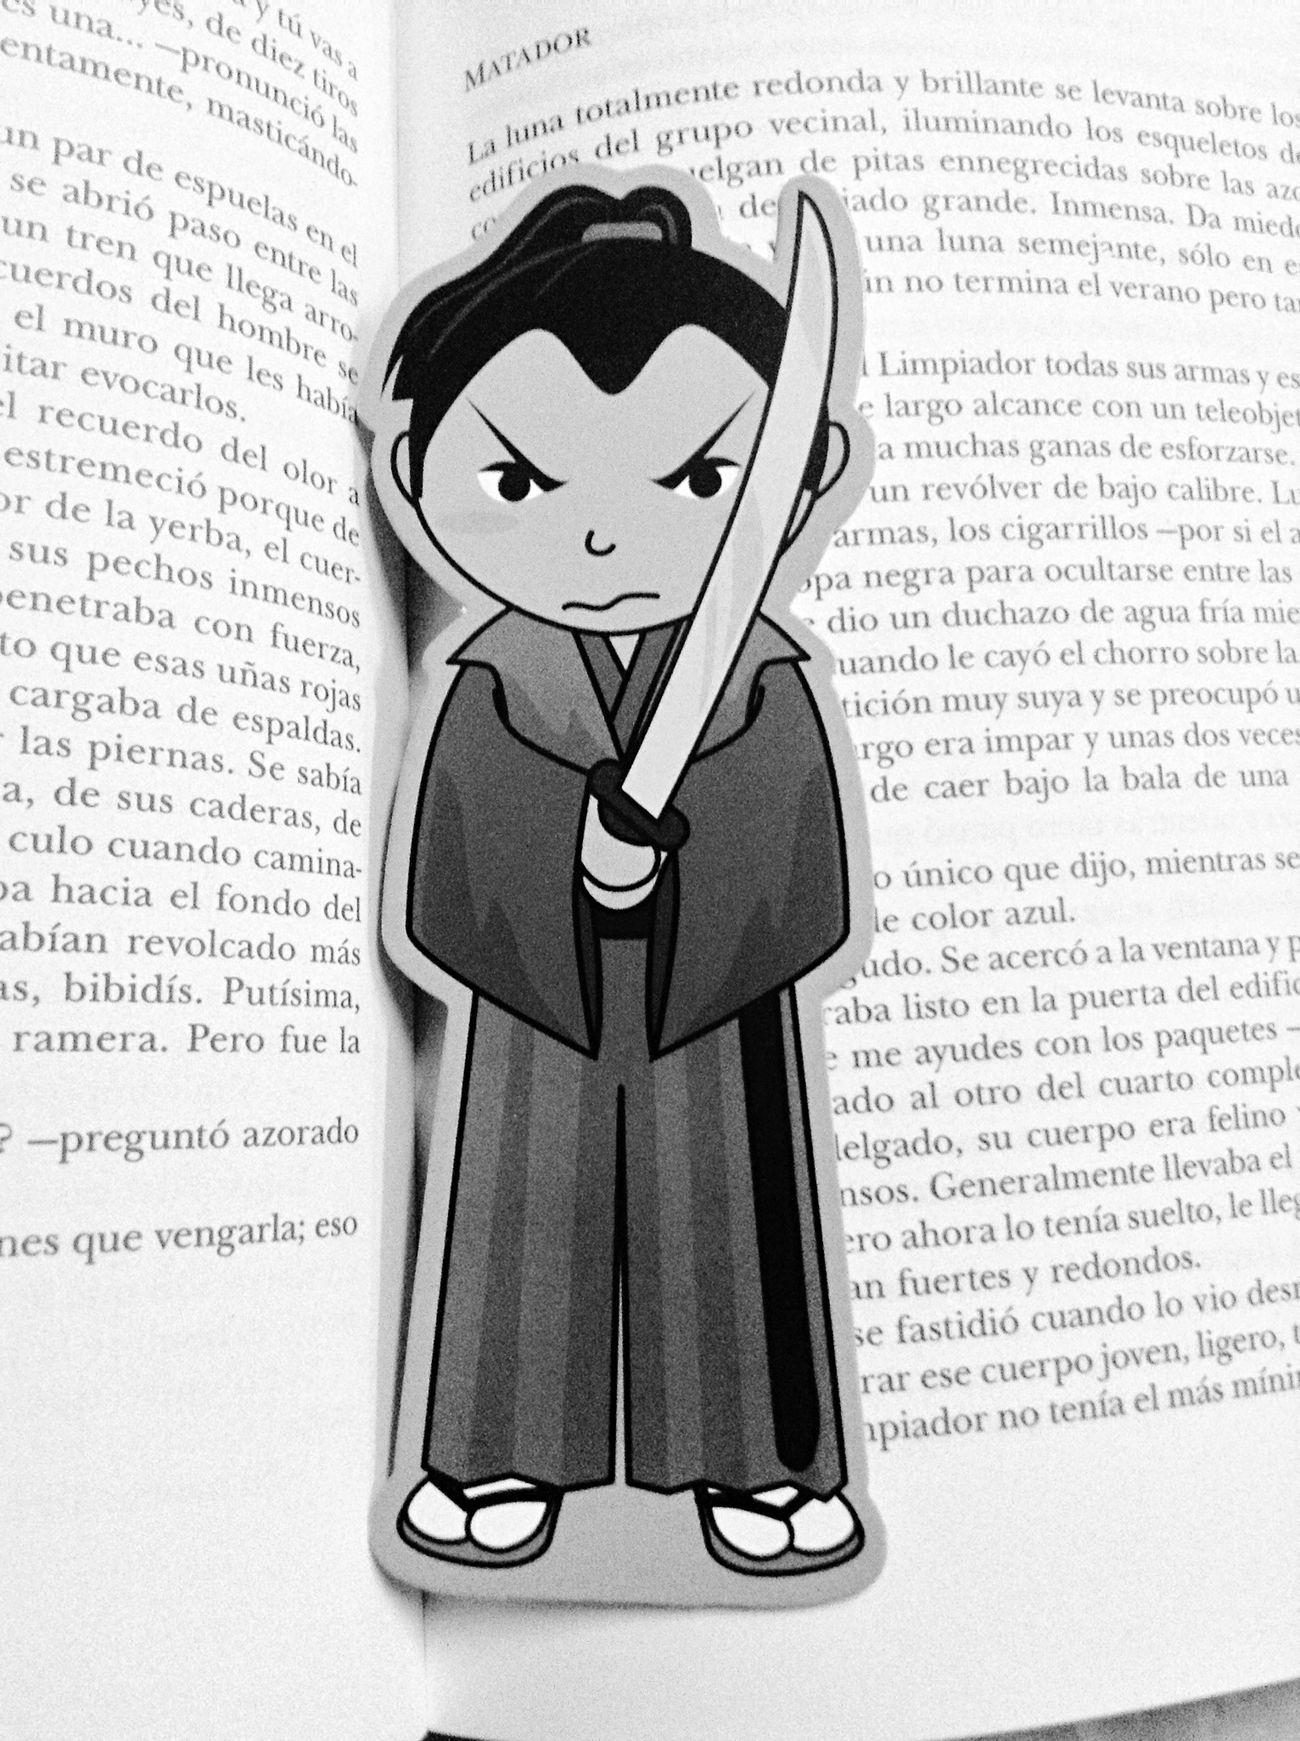 Samurai Bookmark Marcapaginas Marcador De Pagina Señalador Reading Blancoynegro Blackandwhite